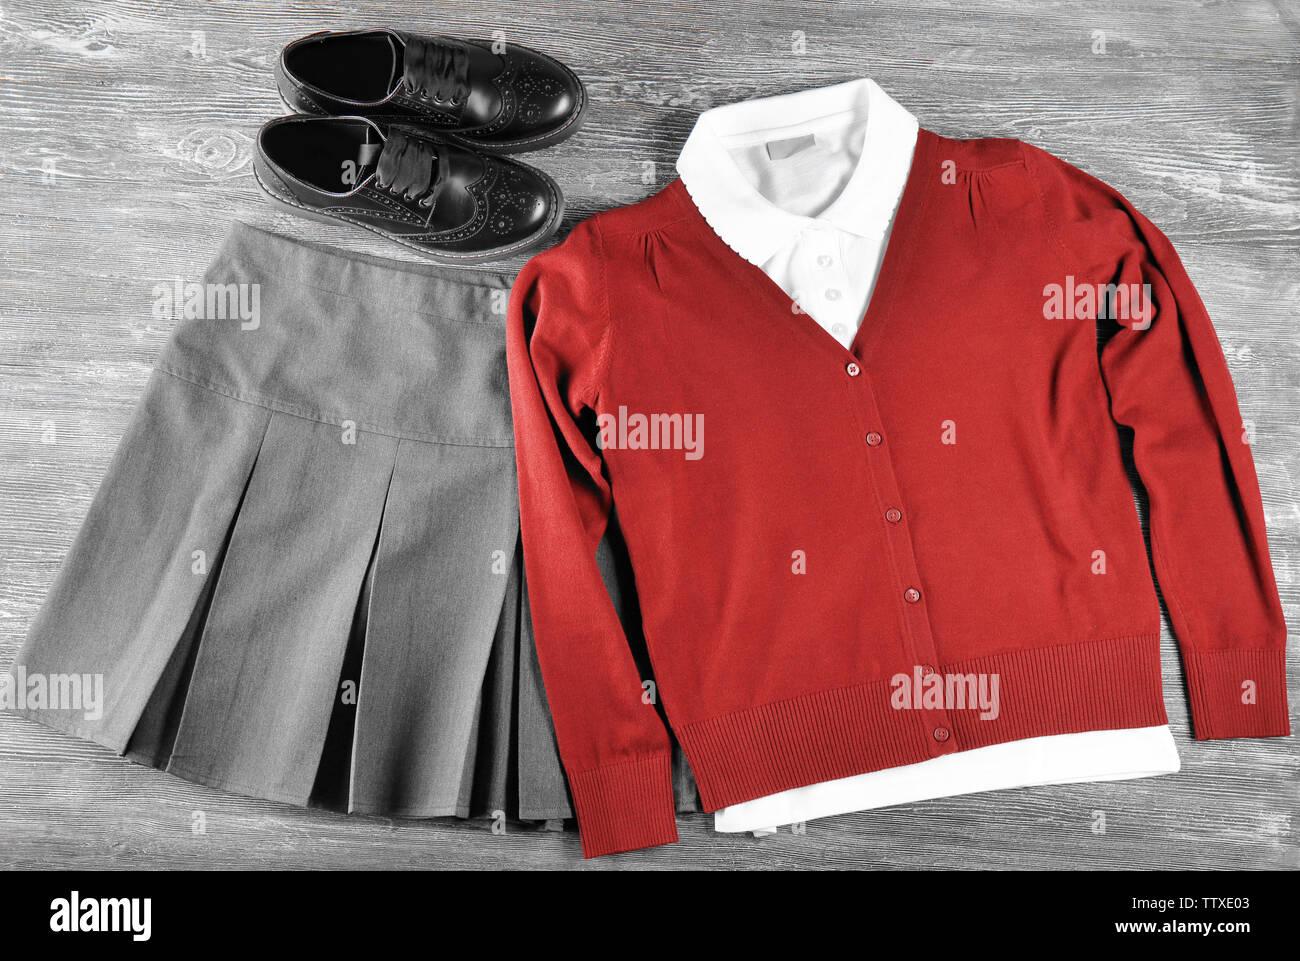 School uniform on wooden background - Stock Image